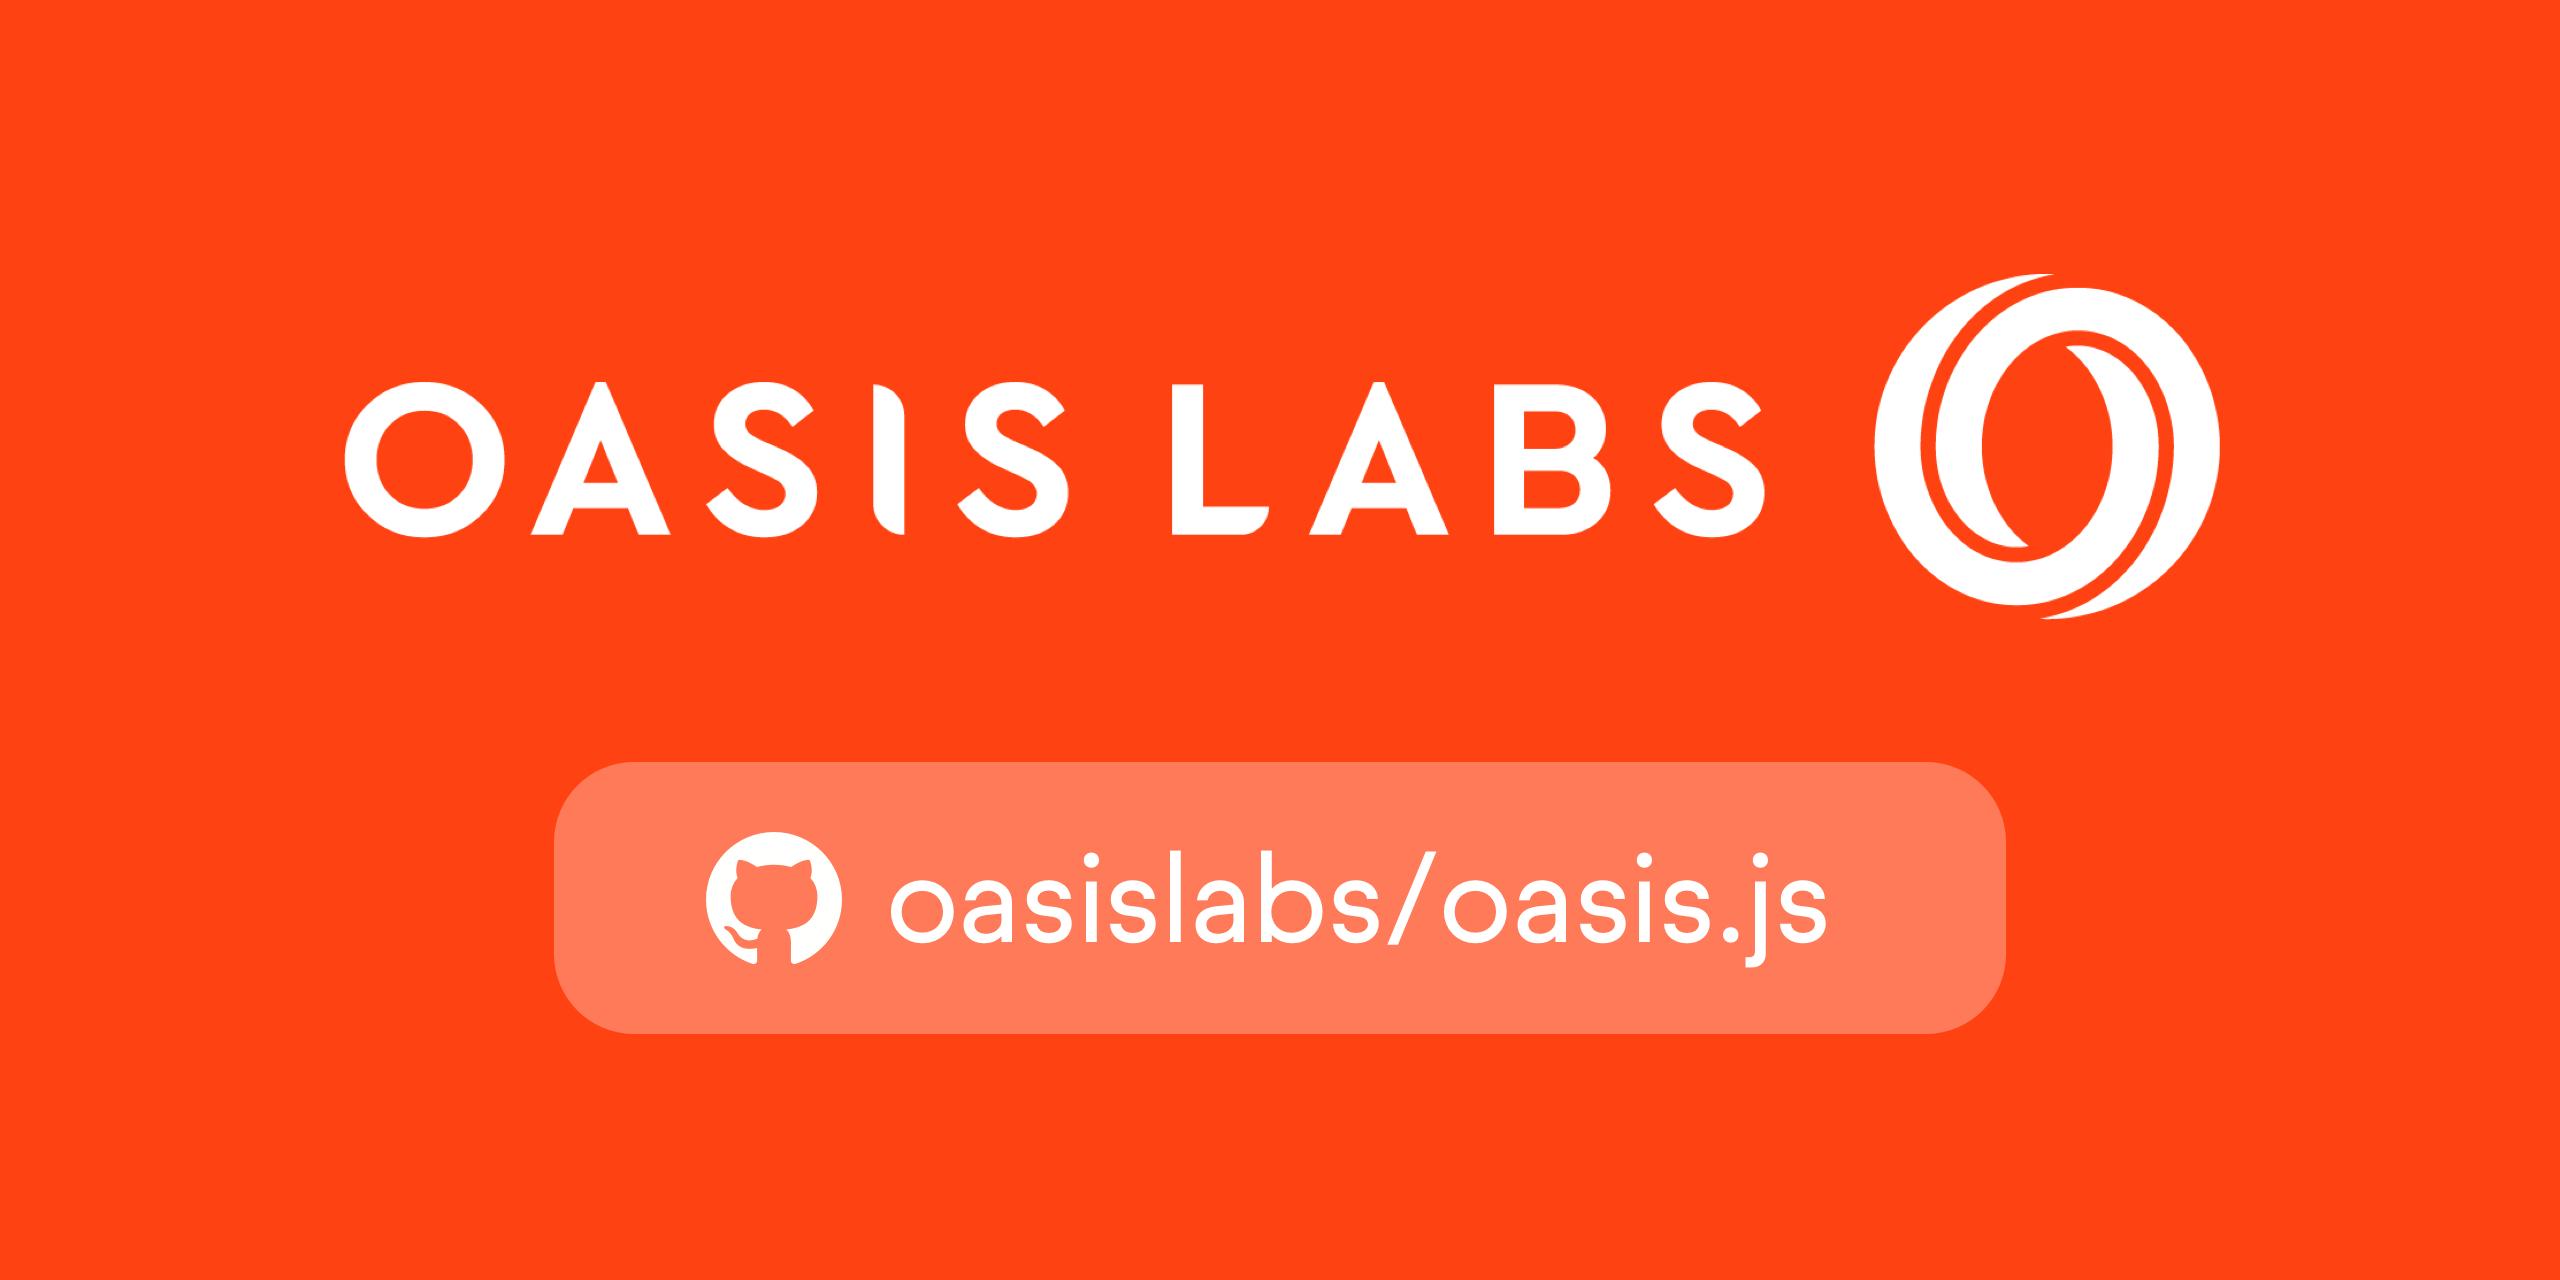 oasis.js